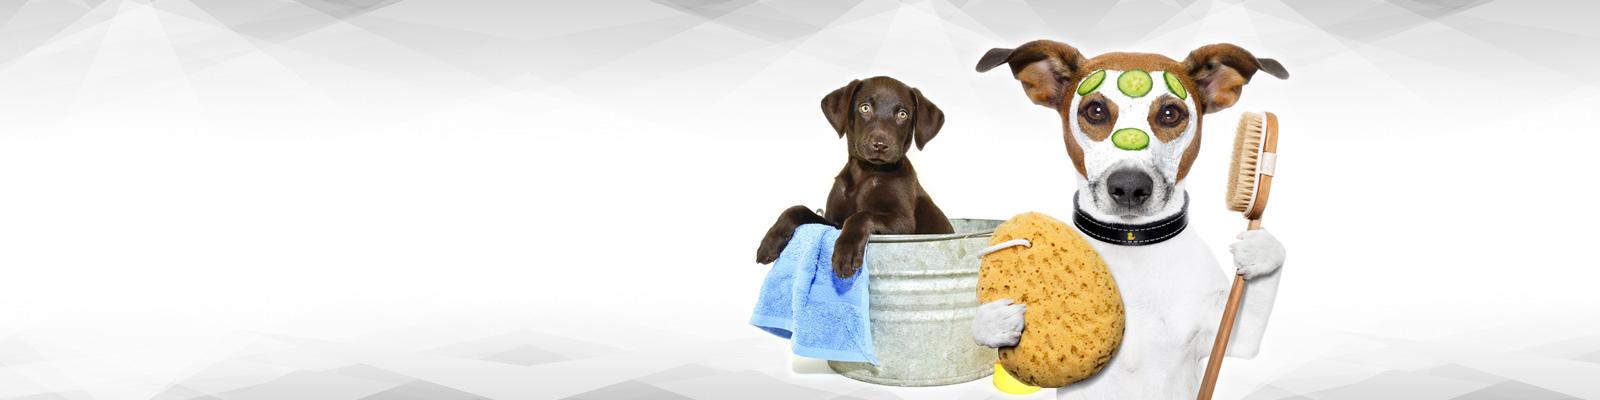 Pat The Dog | Dog Grooming